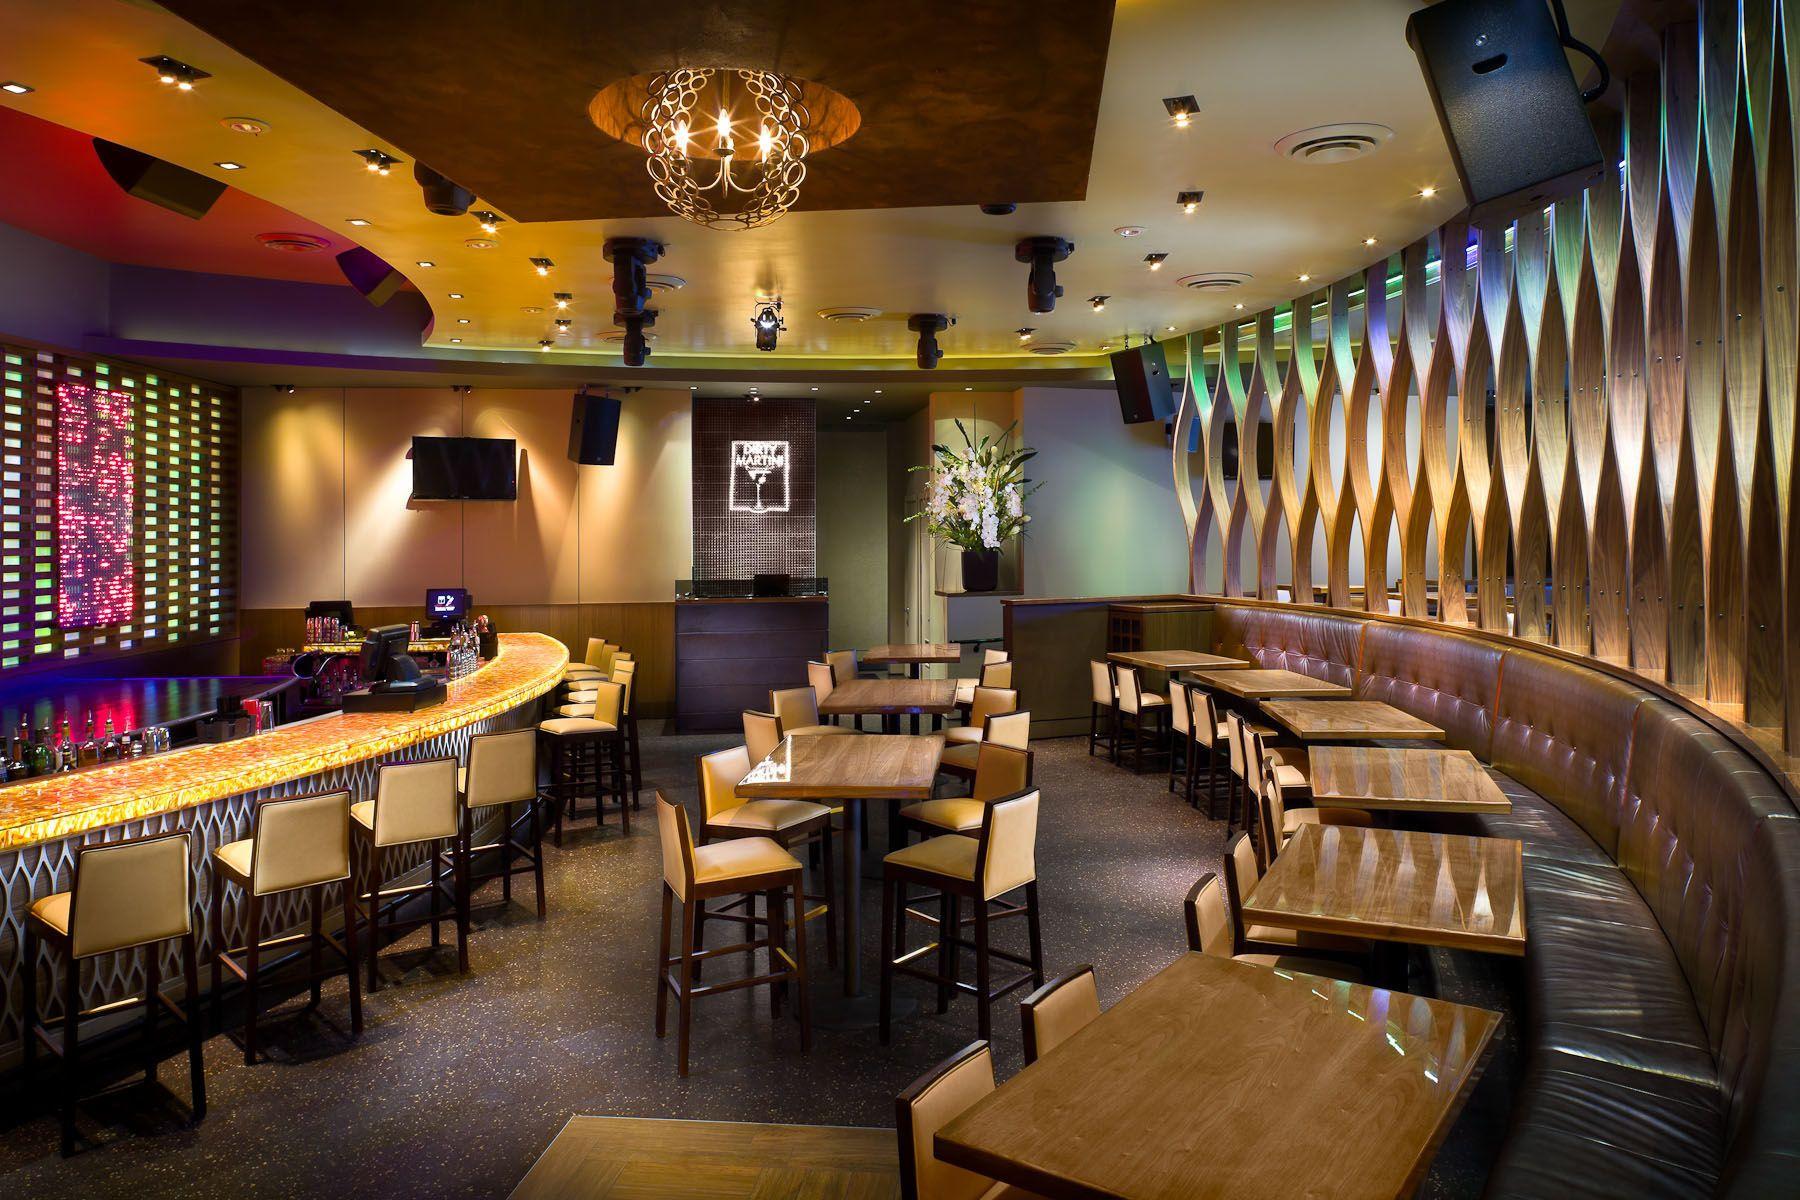 Cruiseone Kevin Elaine Young Www Grandcruisevacation Com Celebritycruises Luxuarycruises Nightclub Design Club Design Design